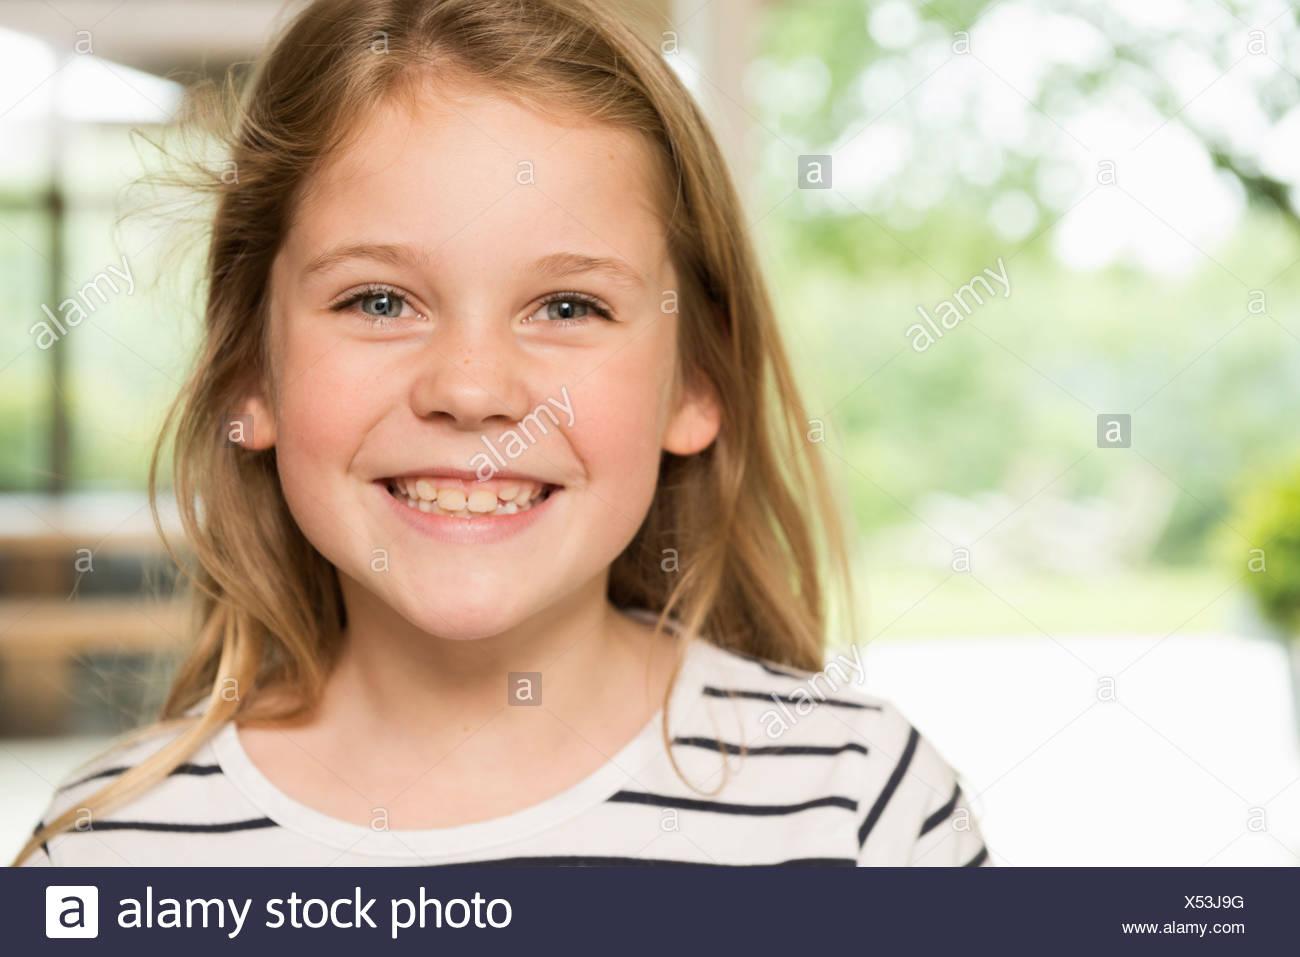 Mädchen mit breiten Lächeln Stockbild